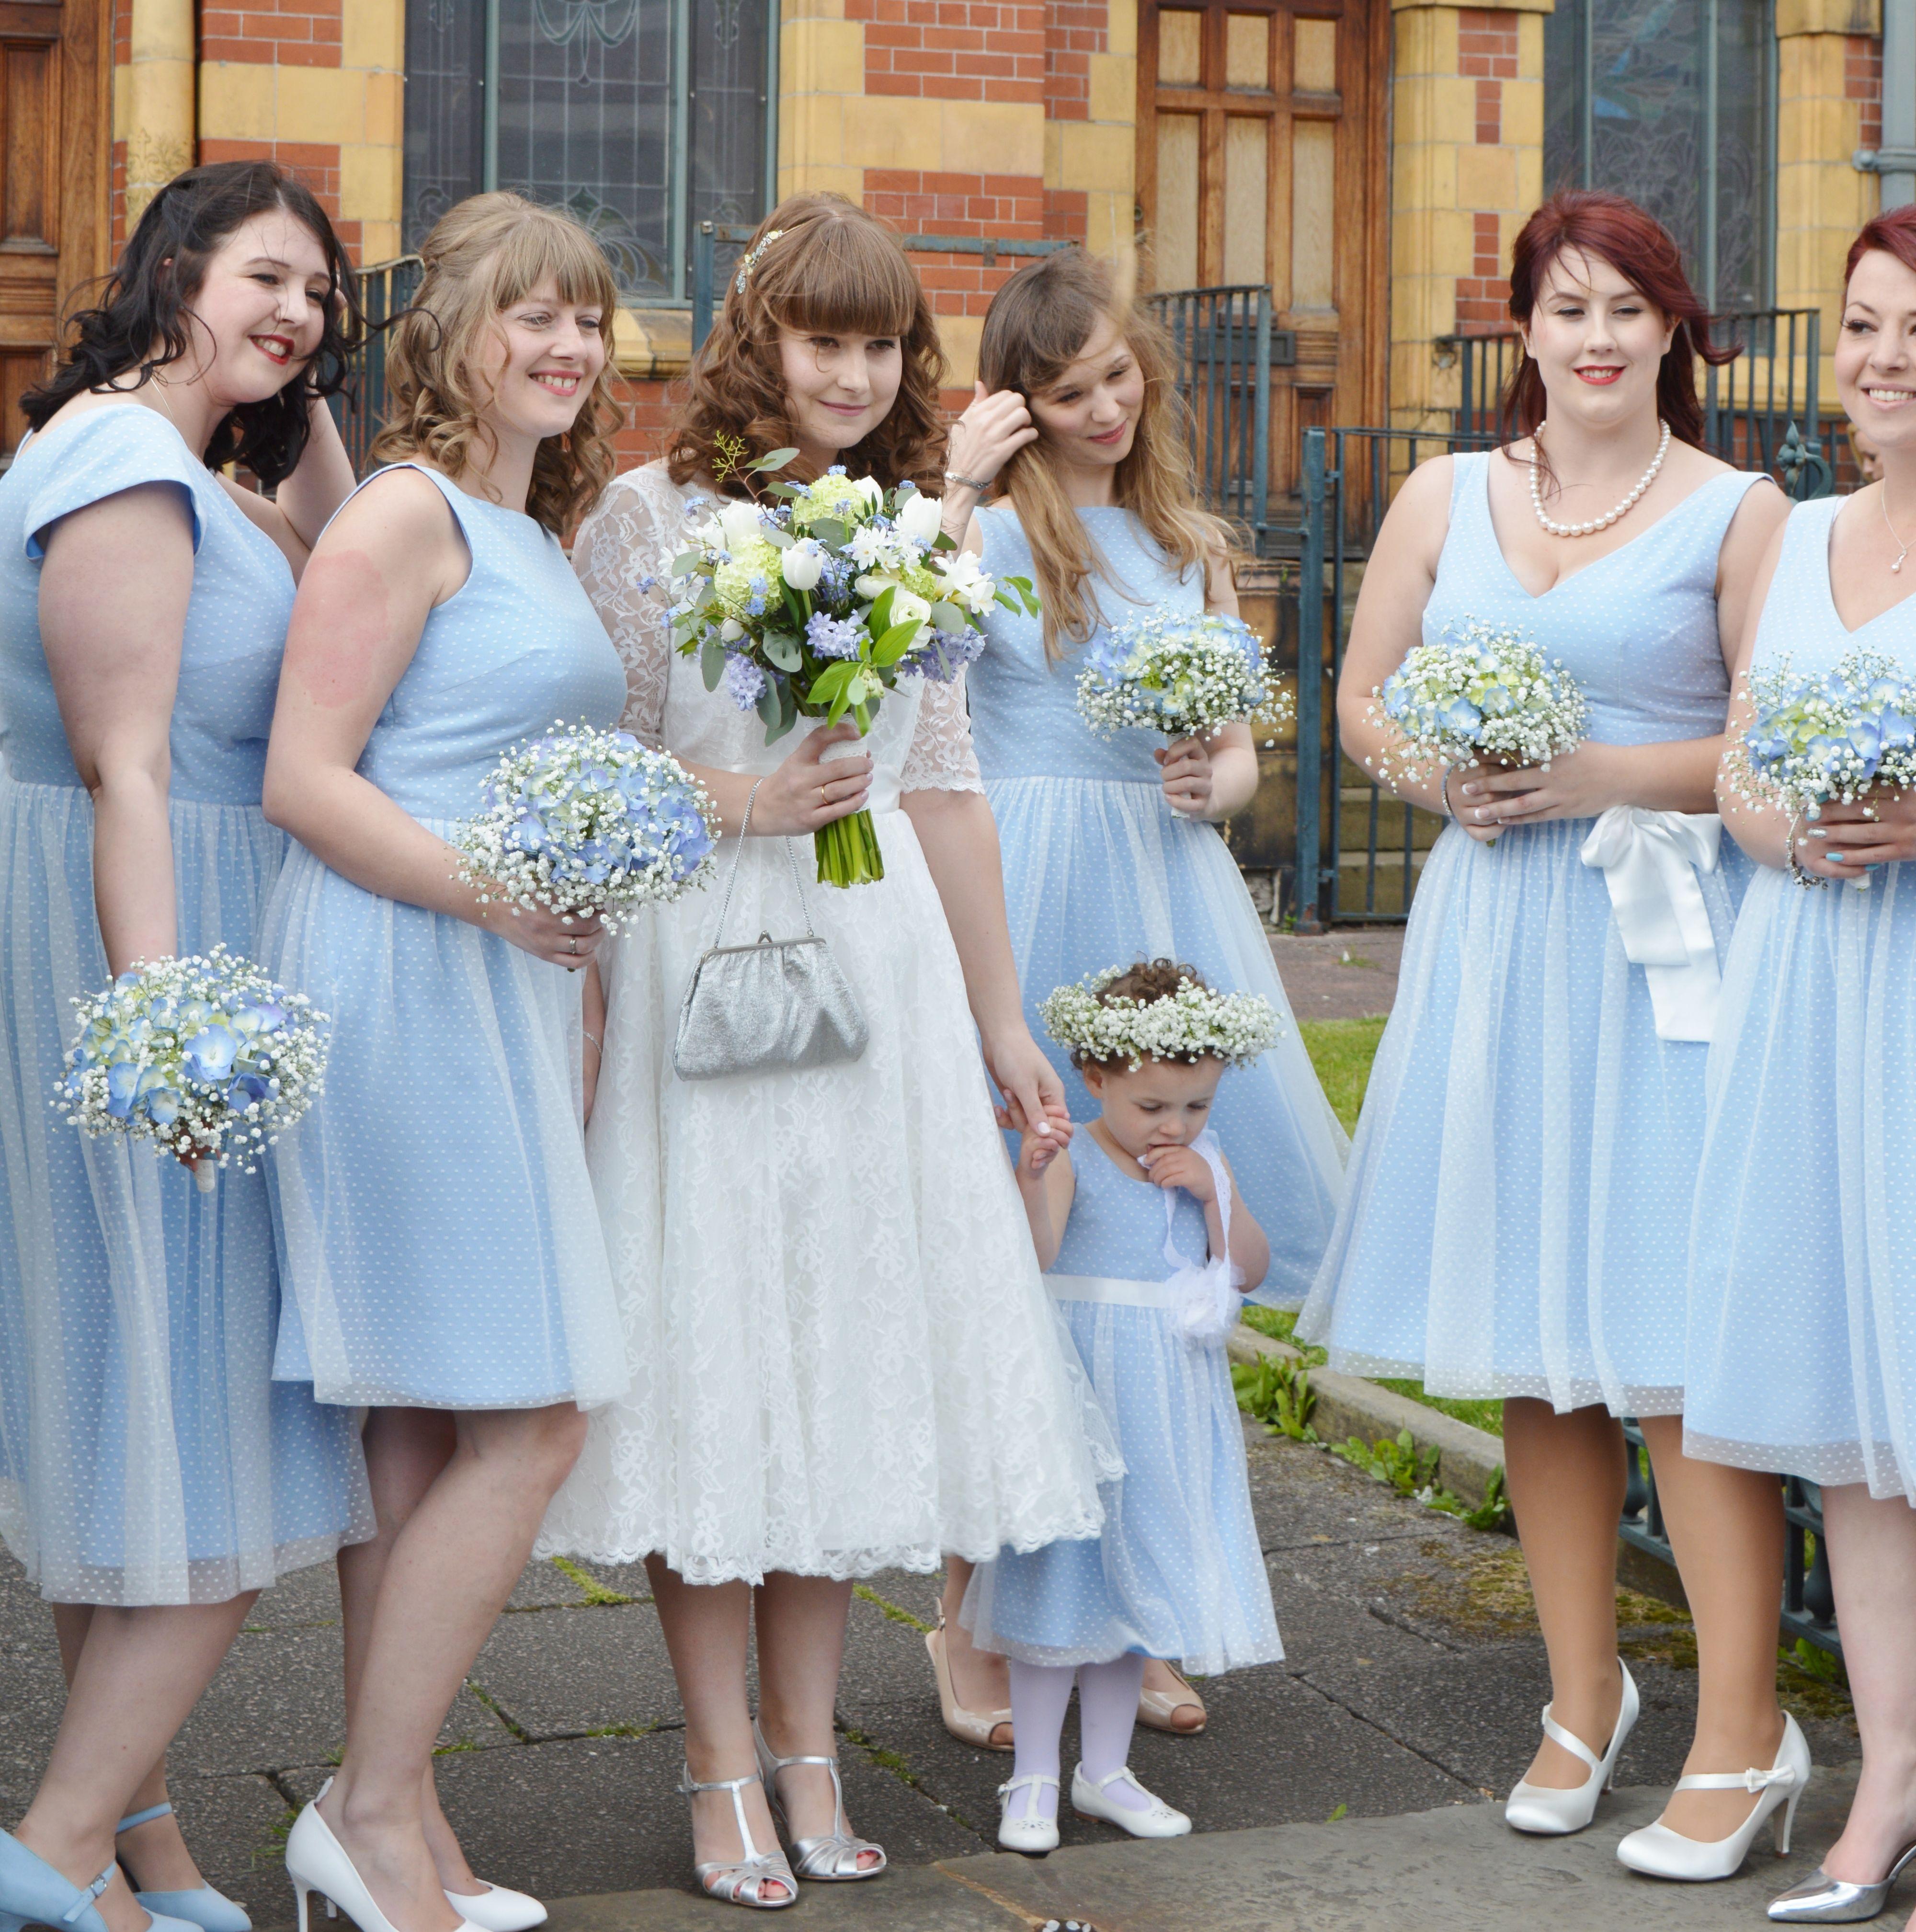 Pretty vintage wedding at Victoria Baths Manchester. Bride bouquets ...